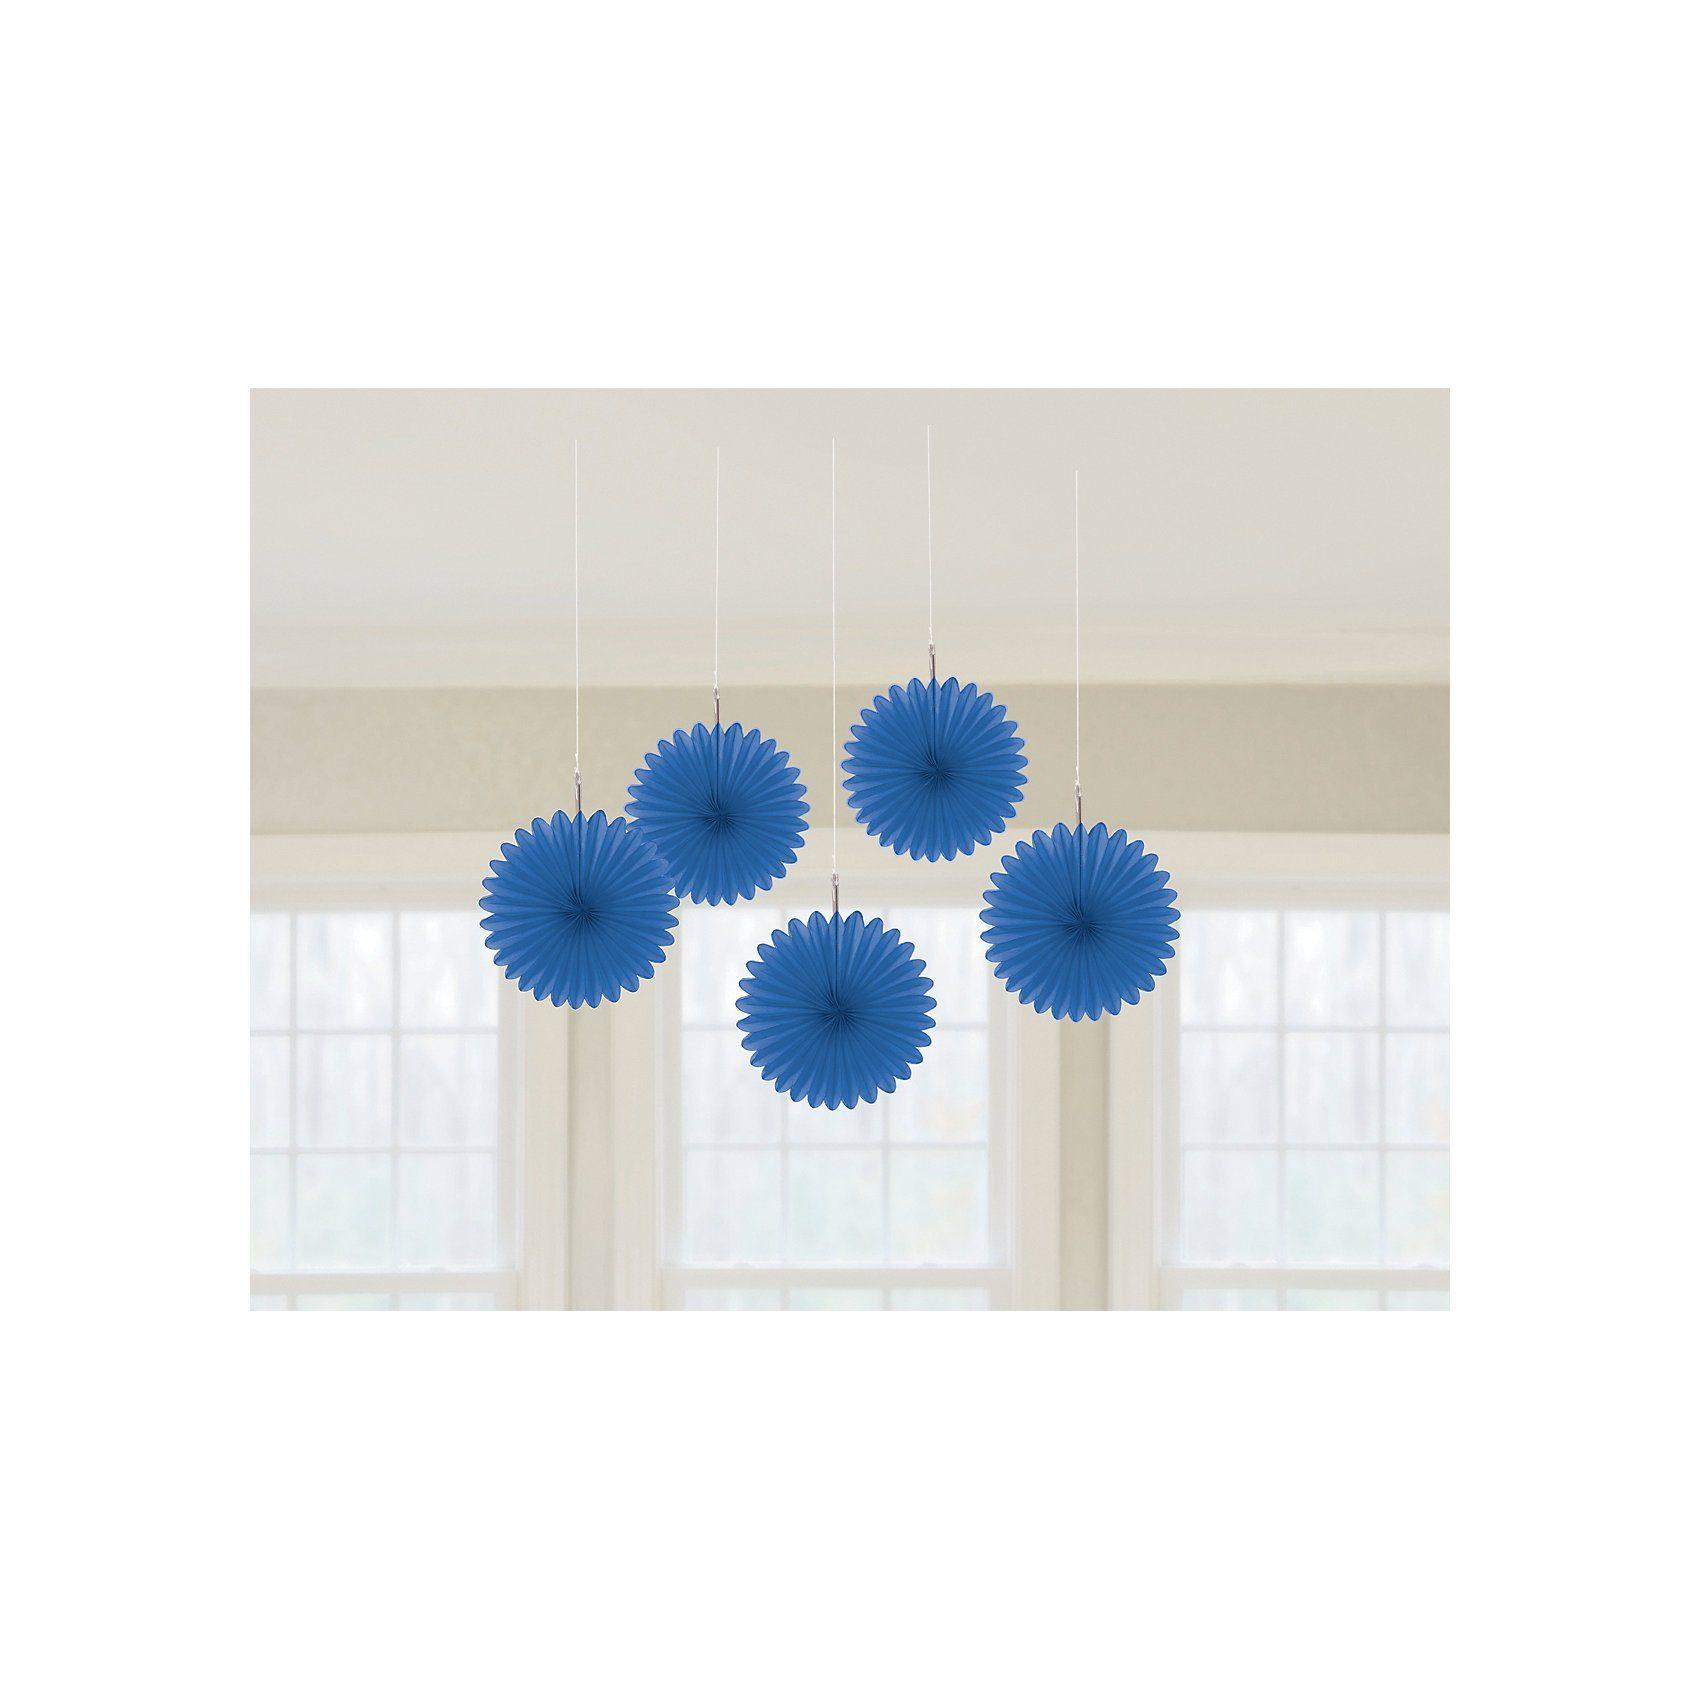 Amscan Deko-Fächer blau, 5 Stück